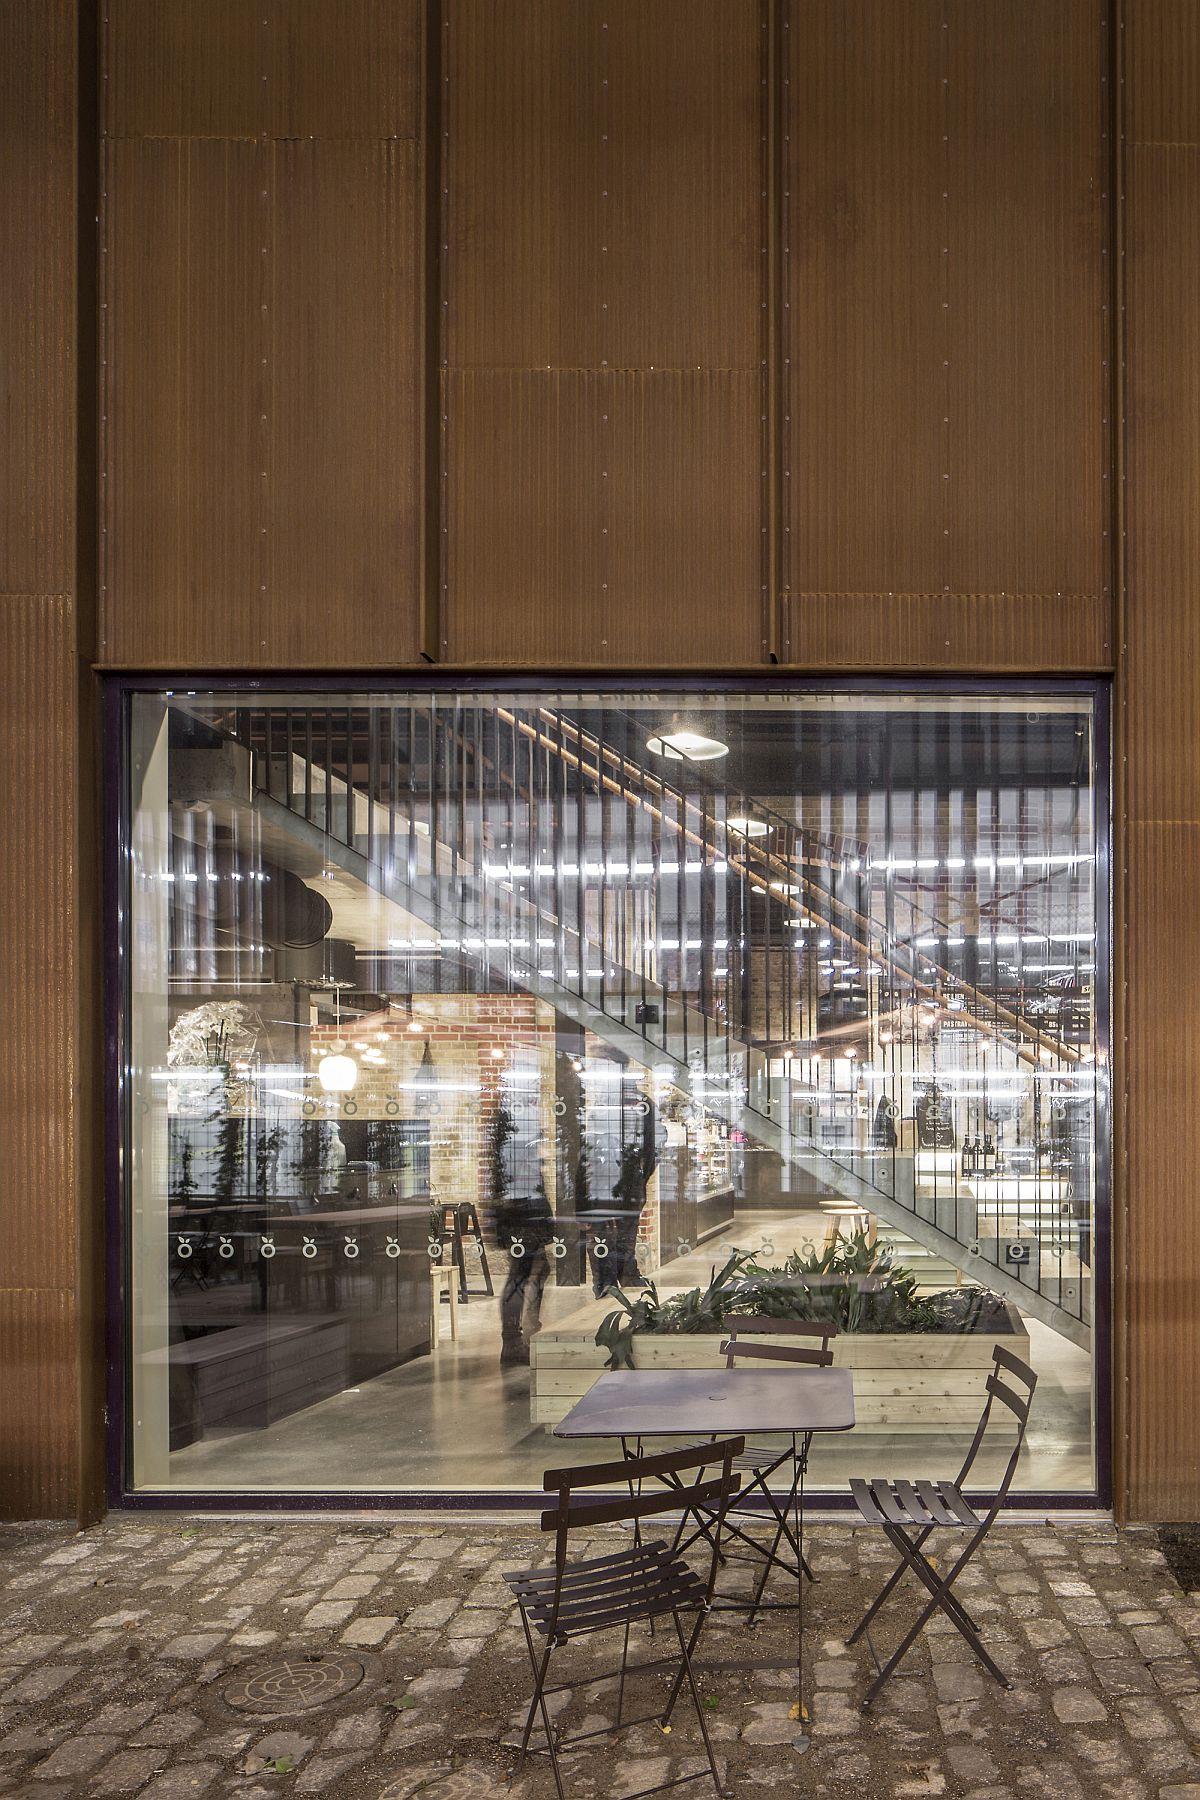 Glass-windows-bring-ventilation-into-the-market-complex